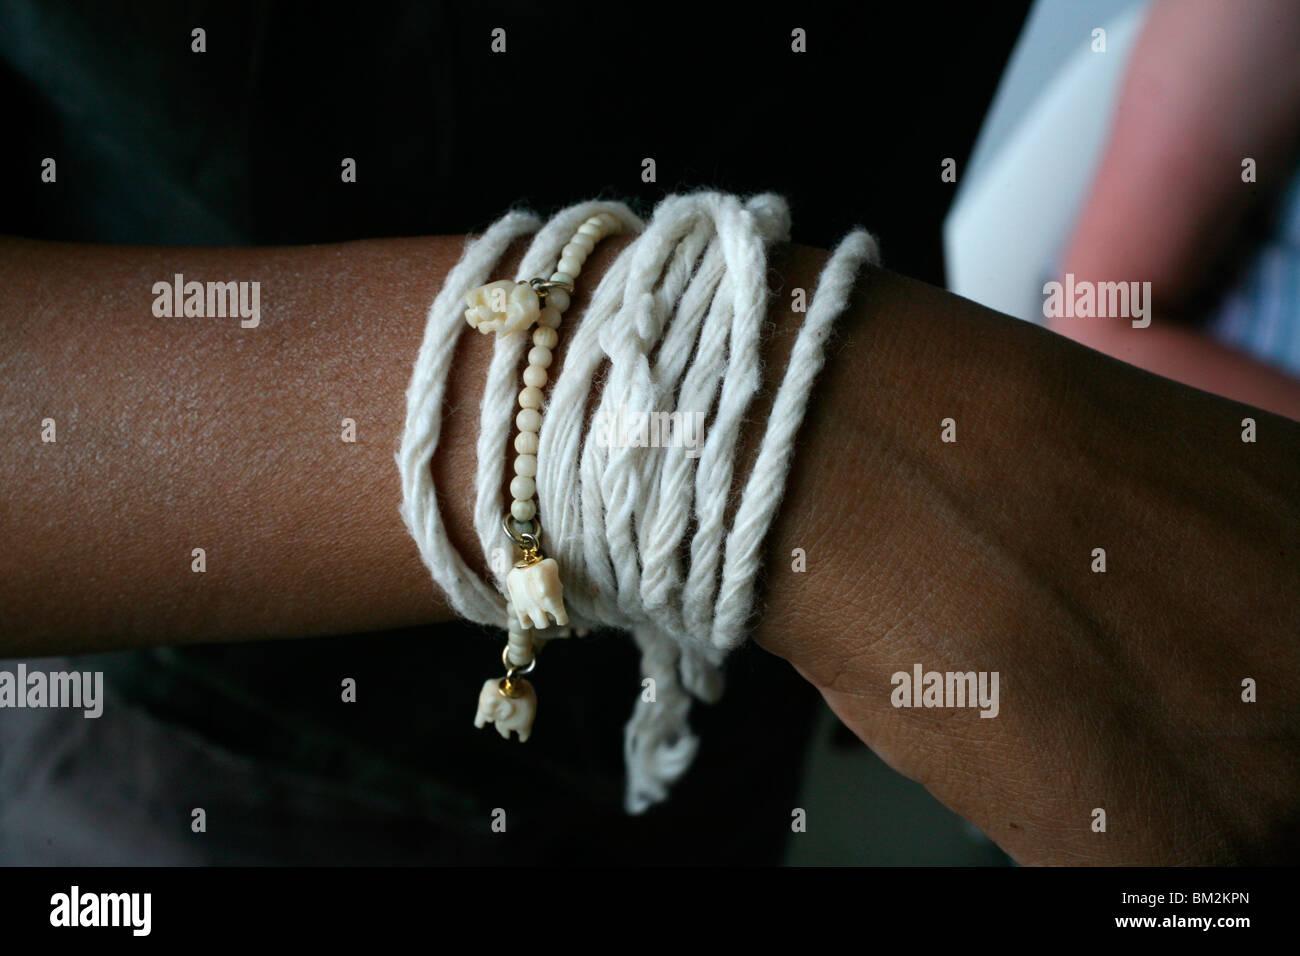 Buddhist wrist strings, Luang Prabang, Laos, Indochina, Southeast Asia - Stock Image